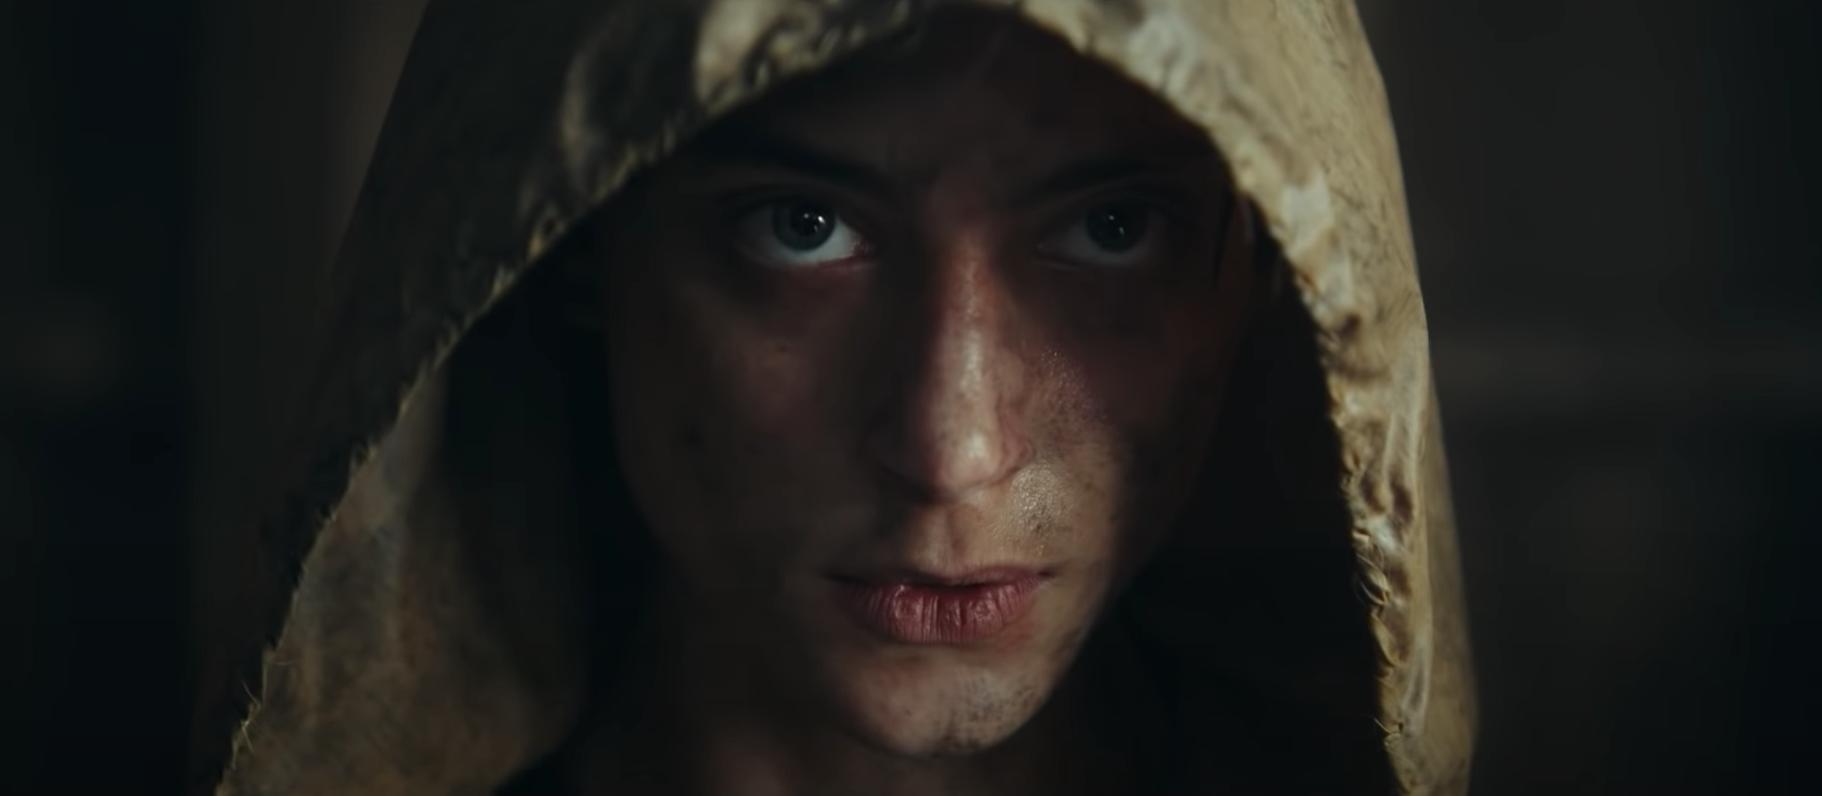 Blake (Nora Arnezeder) - The Colony